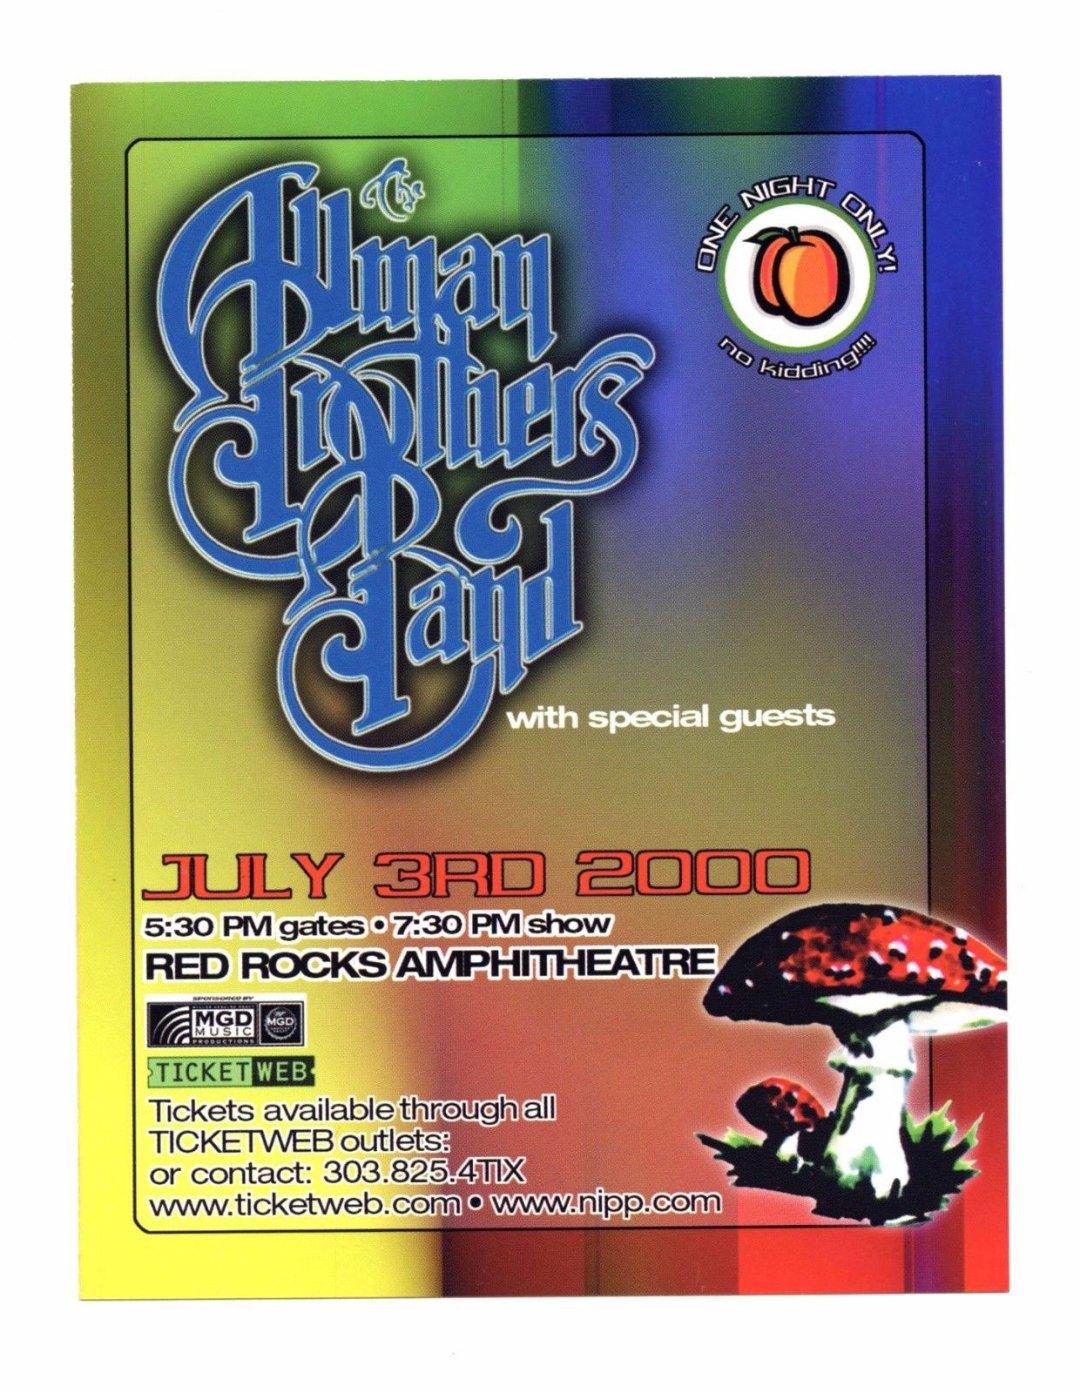 Allman Brothers Band Handbill 2000 Jul 3 Red Rock Amphitheatre Promo 2 sided